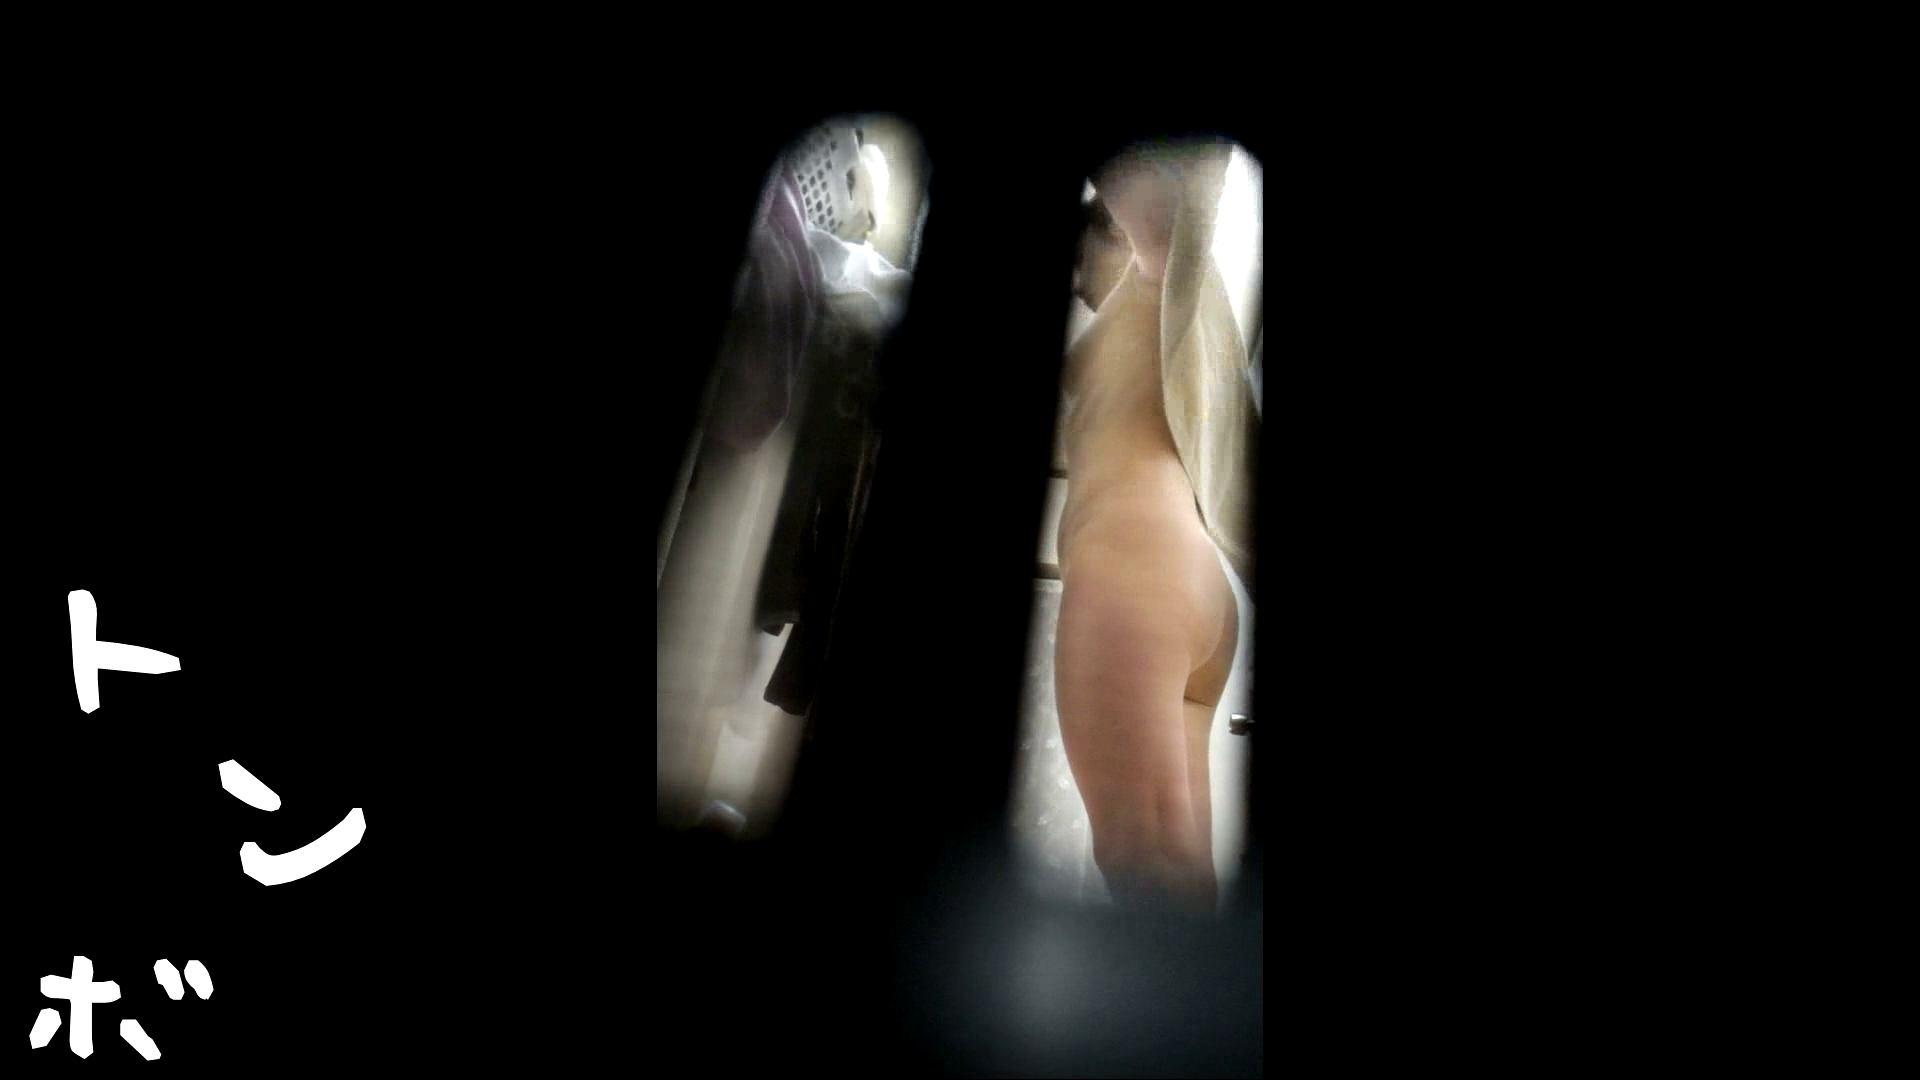 リアル盗撮 美人服飾専門学生の私生活 潜入 スケベ動画紹介 88枚 78